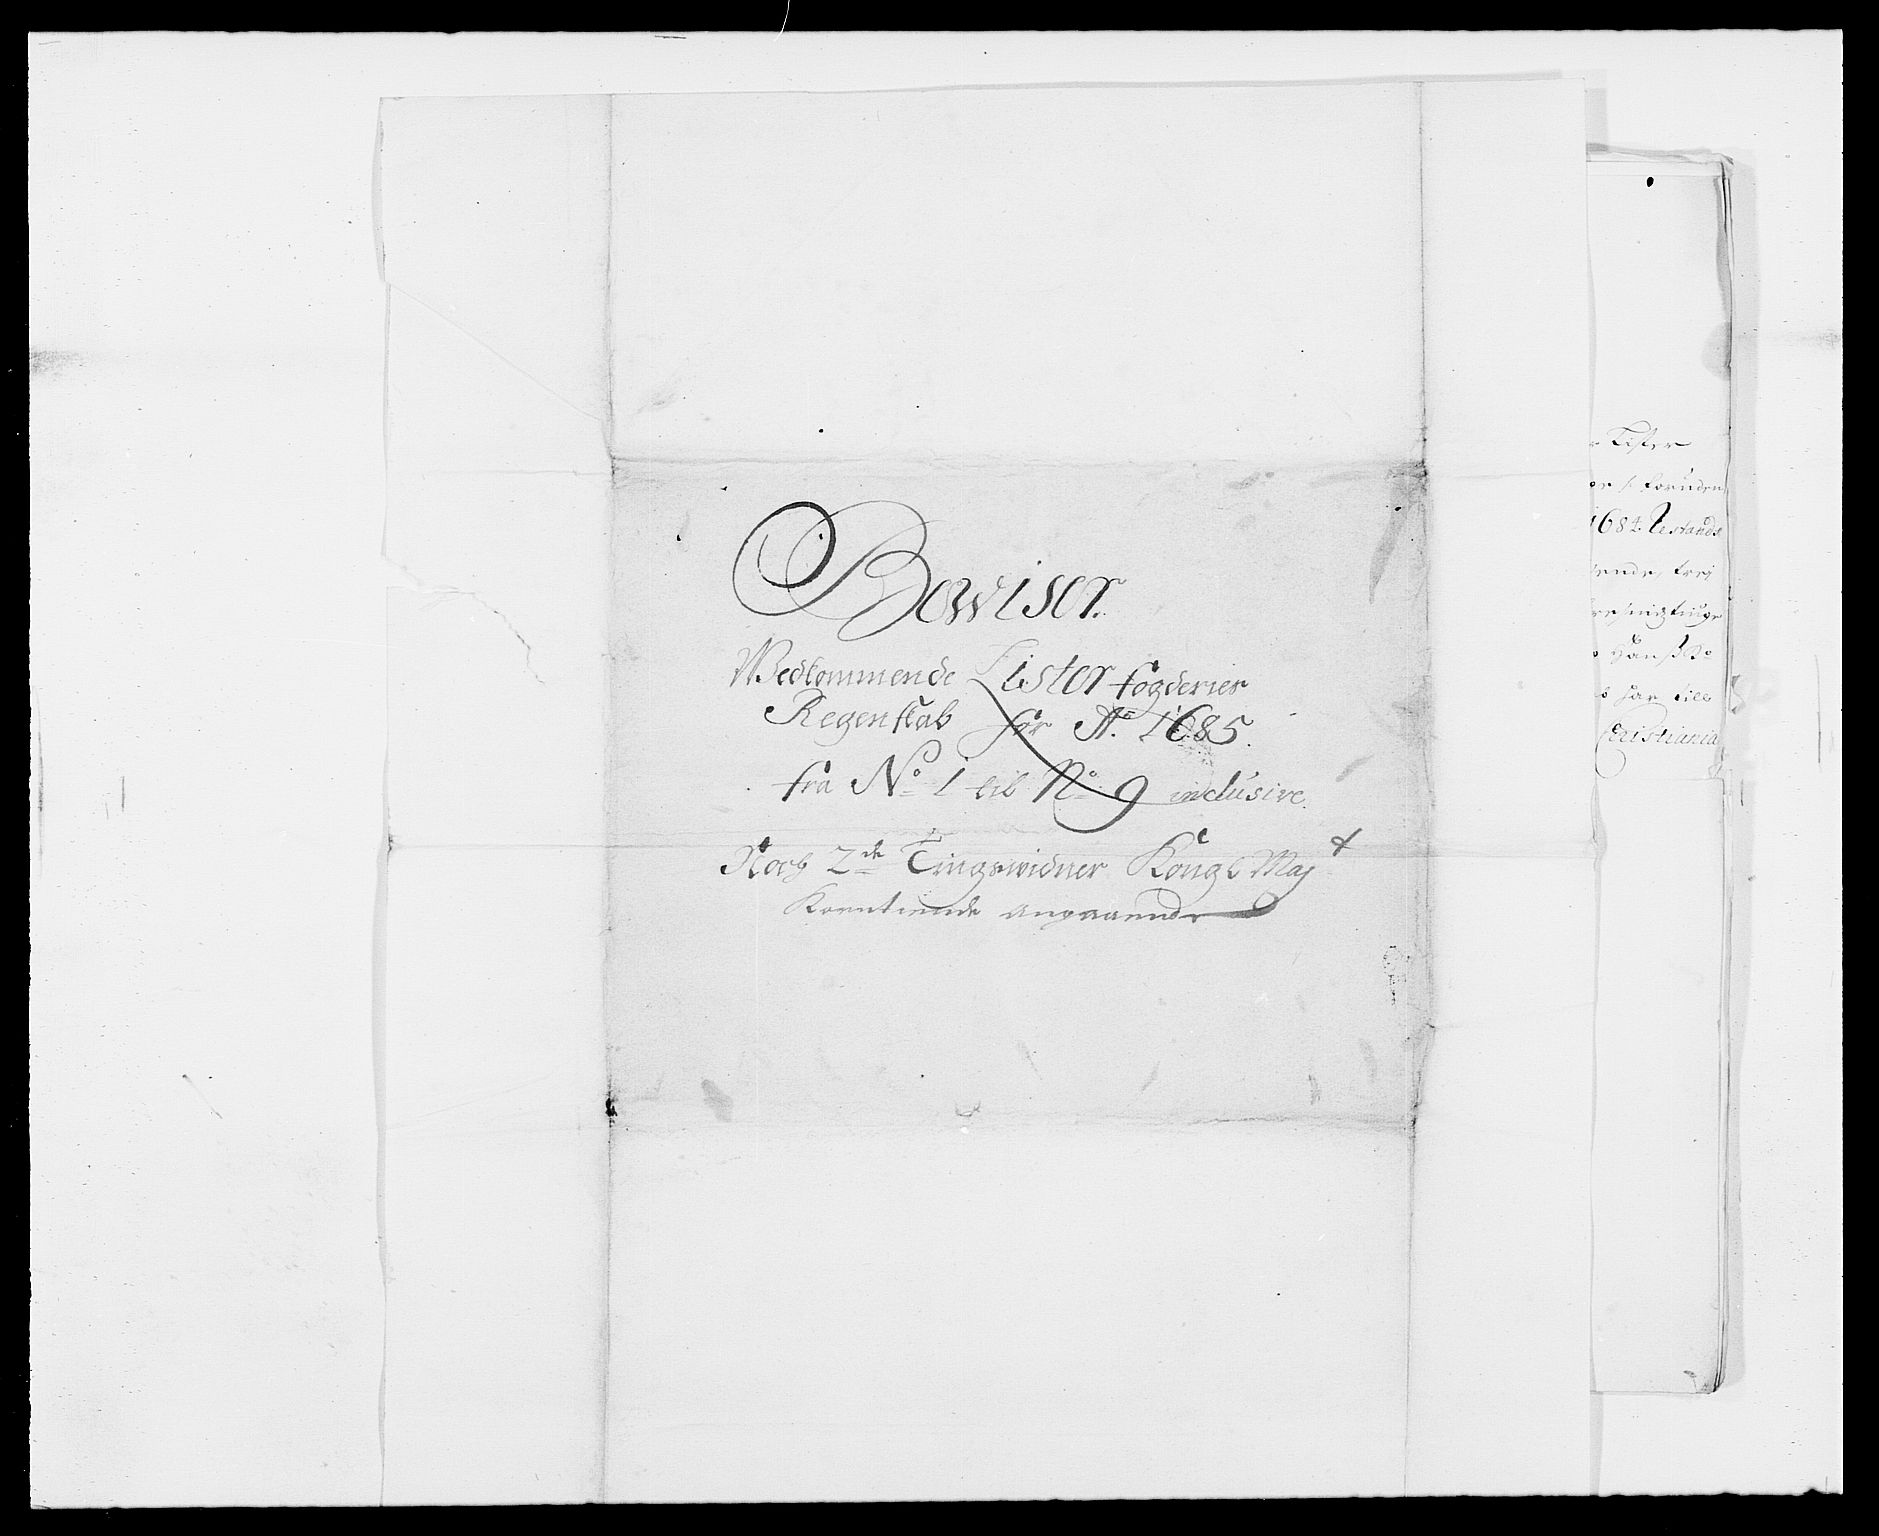 RA, Rentekammeret inntil 1814, Reviderte regnskaper, Fogderegnskap, R41/L2533: Fogderegnskap Lista, 1684-1685, s. 216